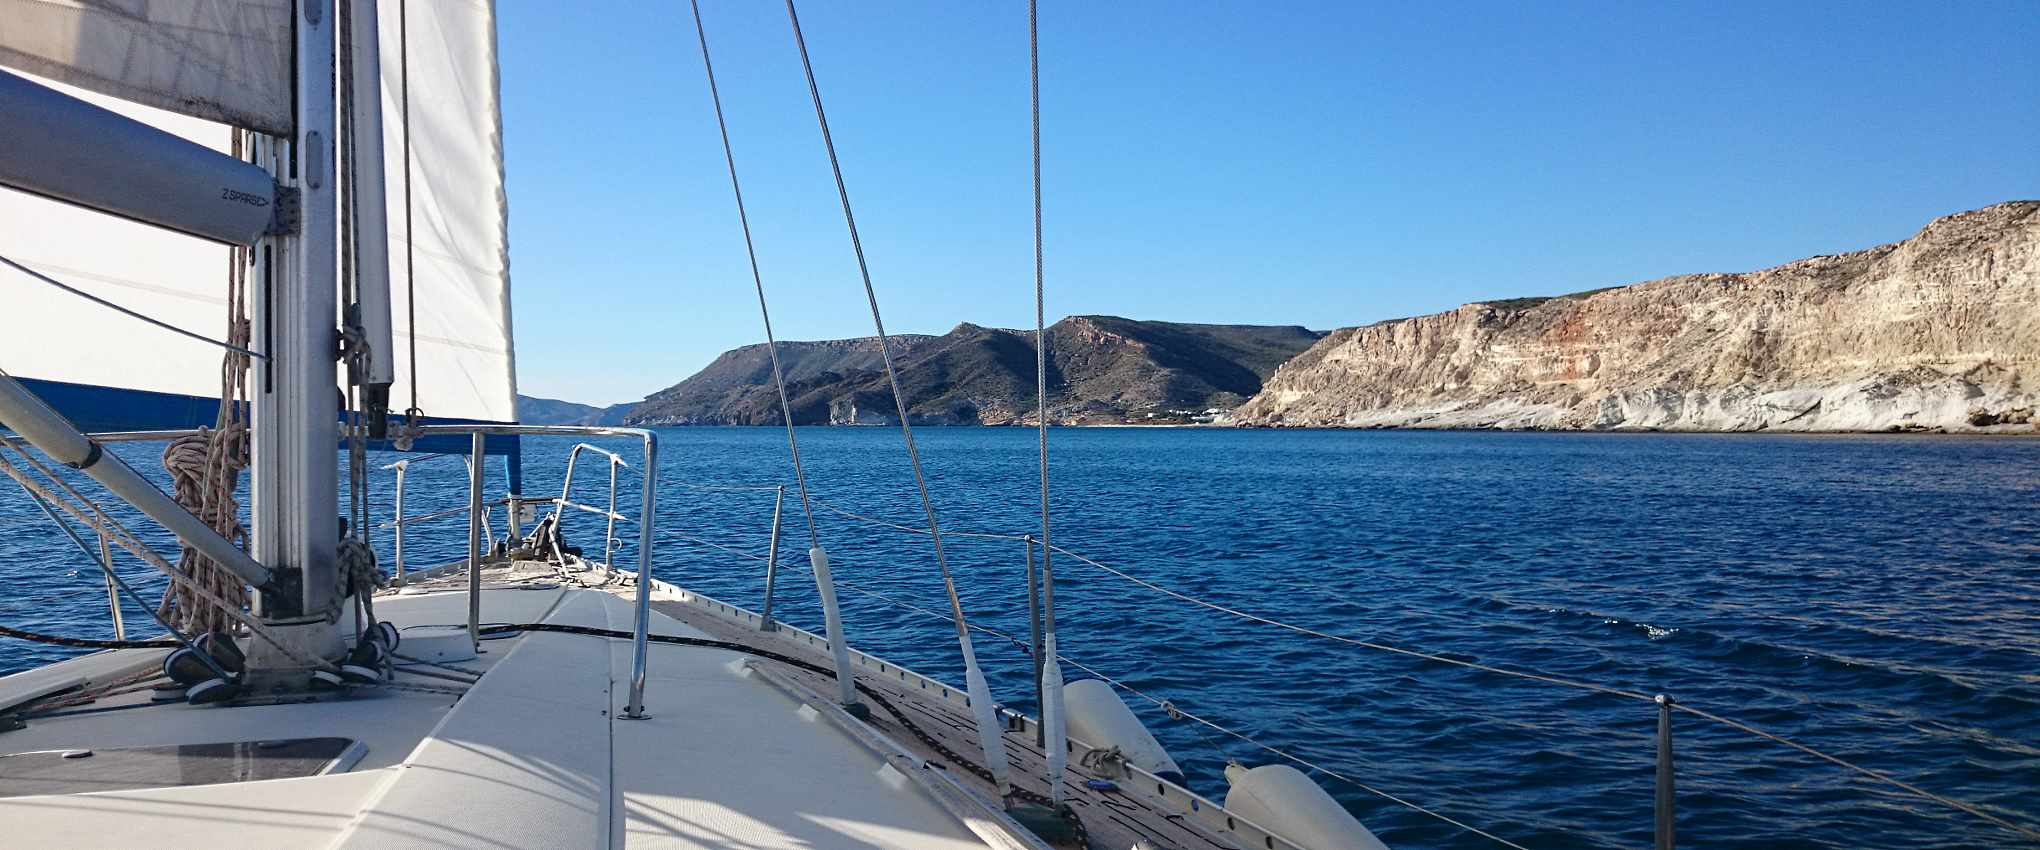 Segeln Costa Cálida